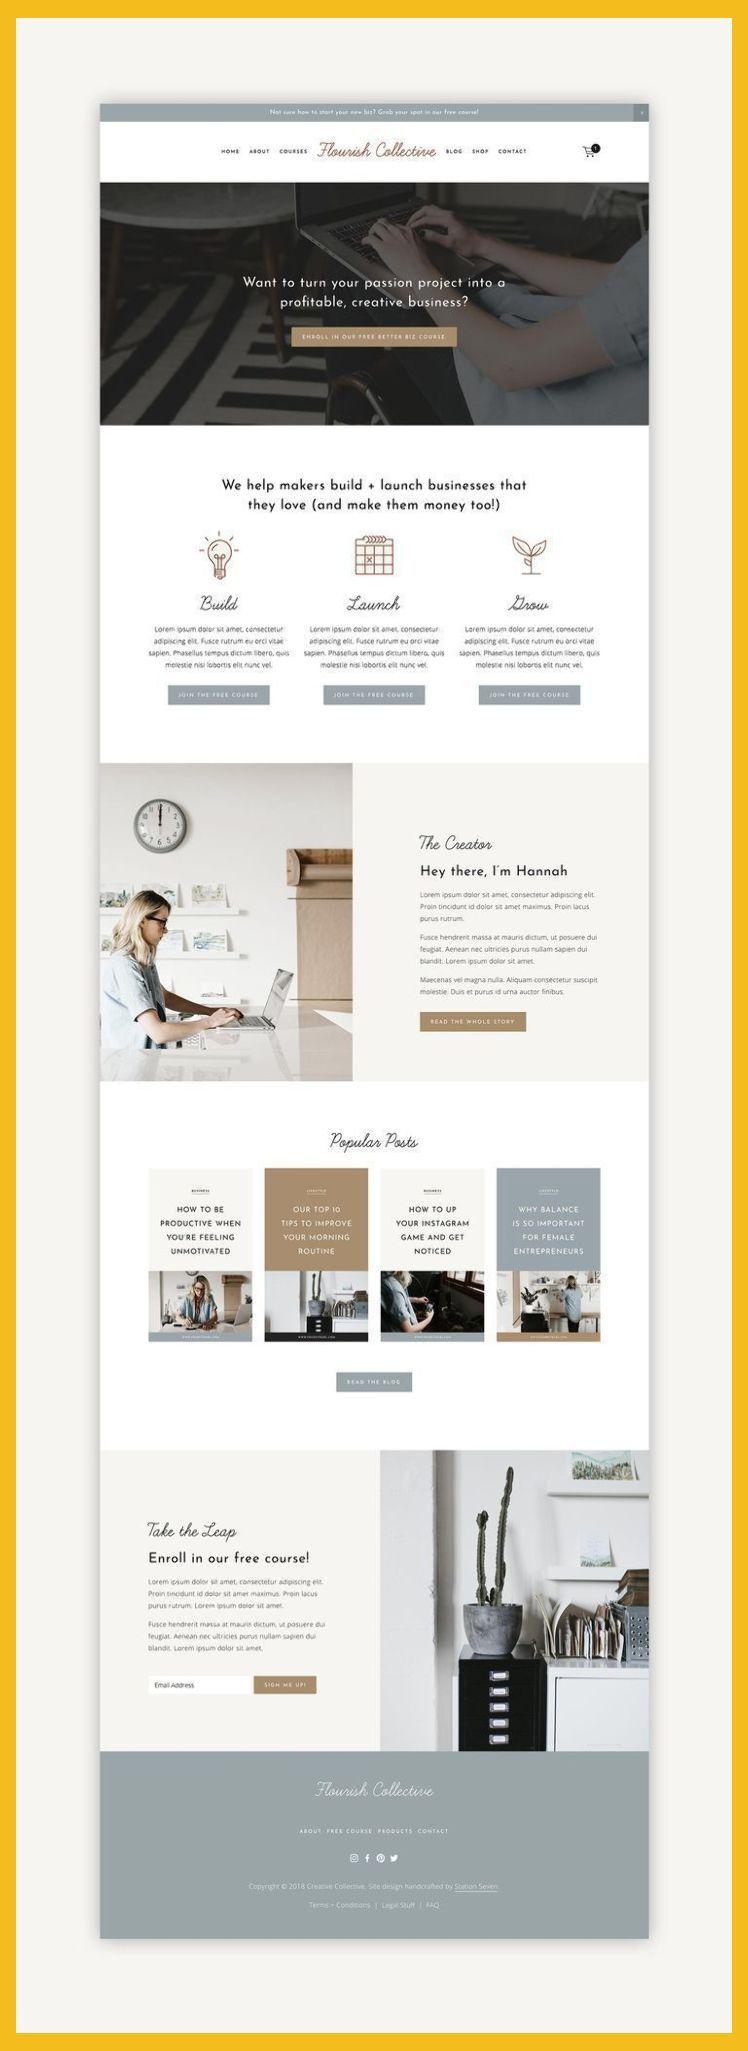 Web Design 2018 Flourish Squarespace Kit Station Seven Squarespace Templates Wordpress Web Design Websites Squarespace Web Design Web Layout Design